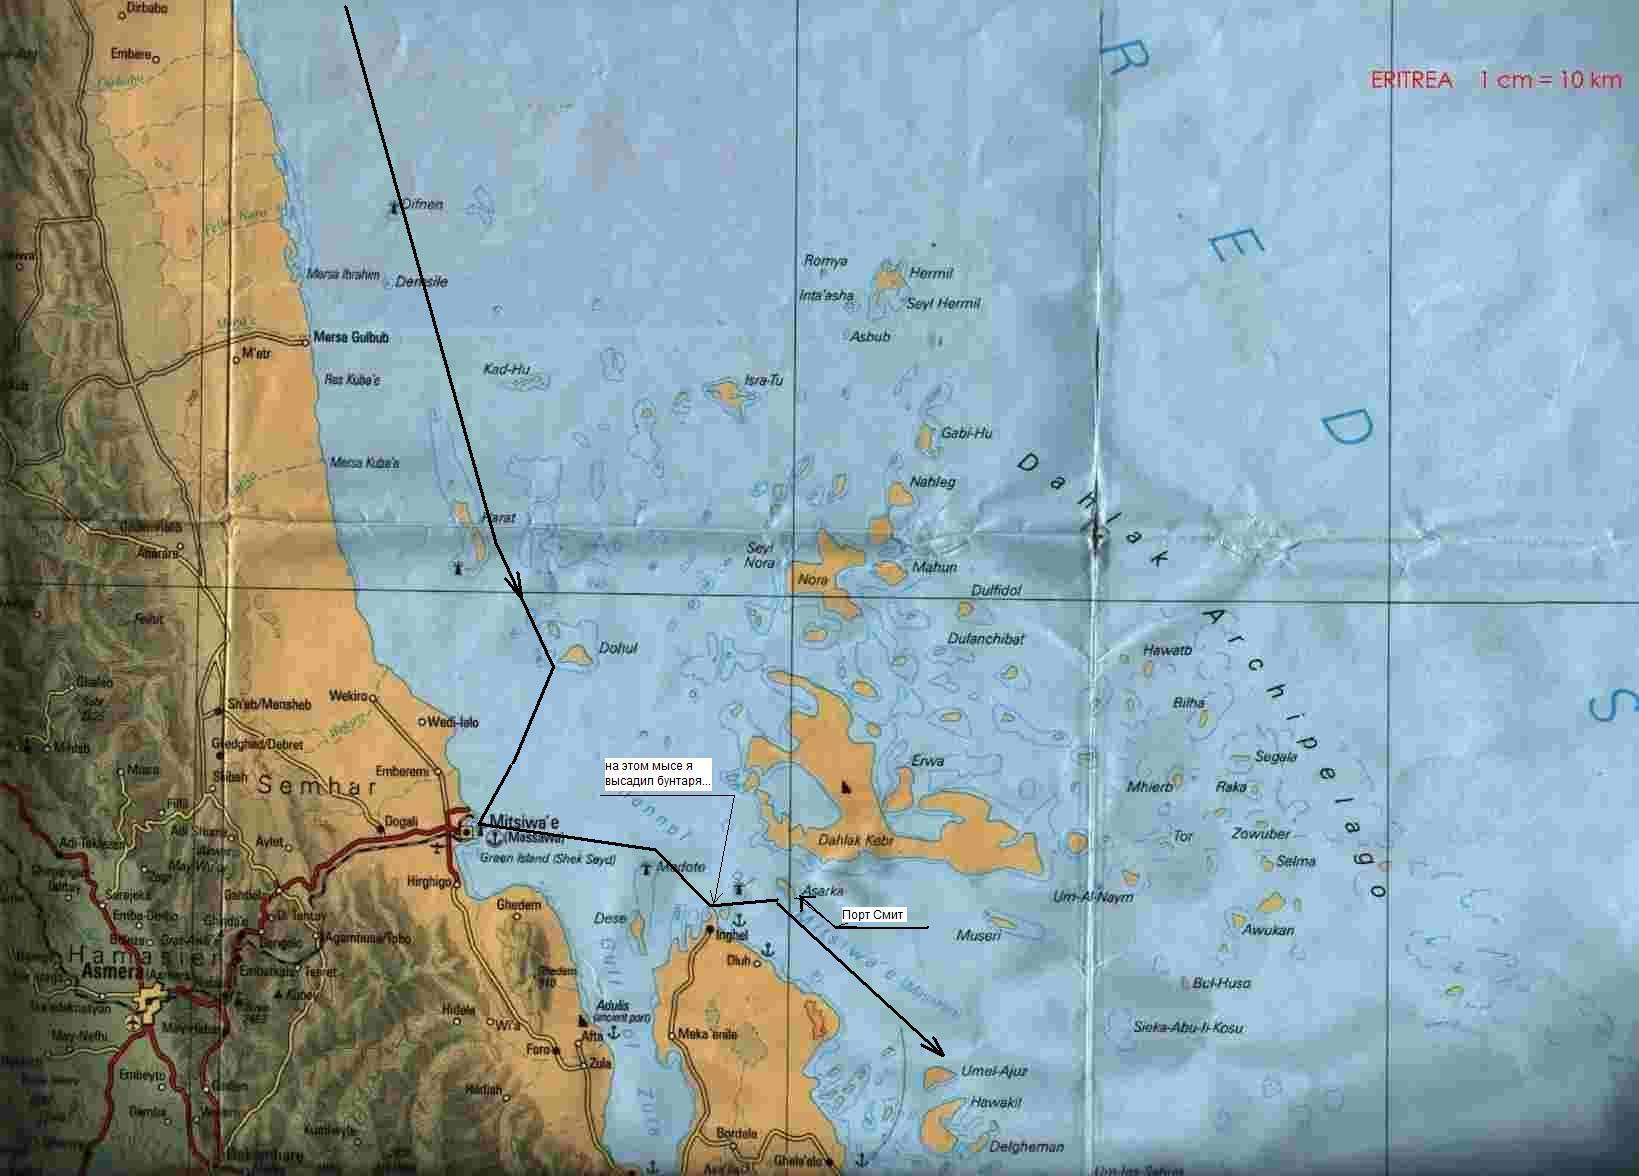 Eritrea-partmap